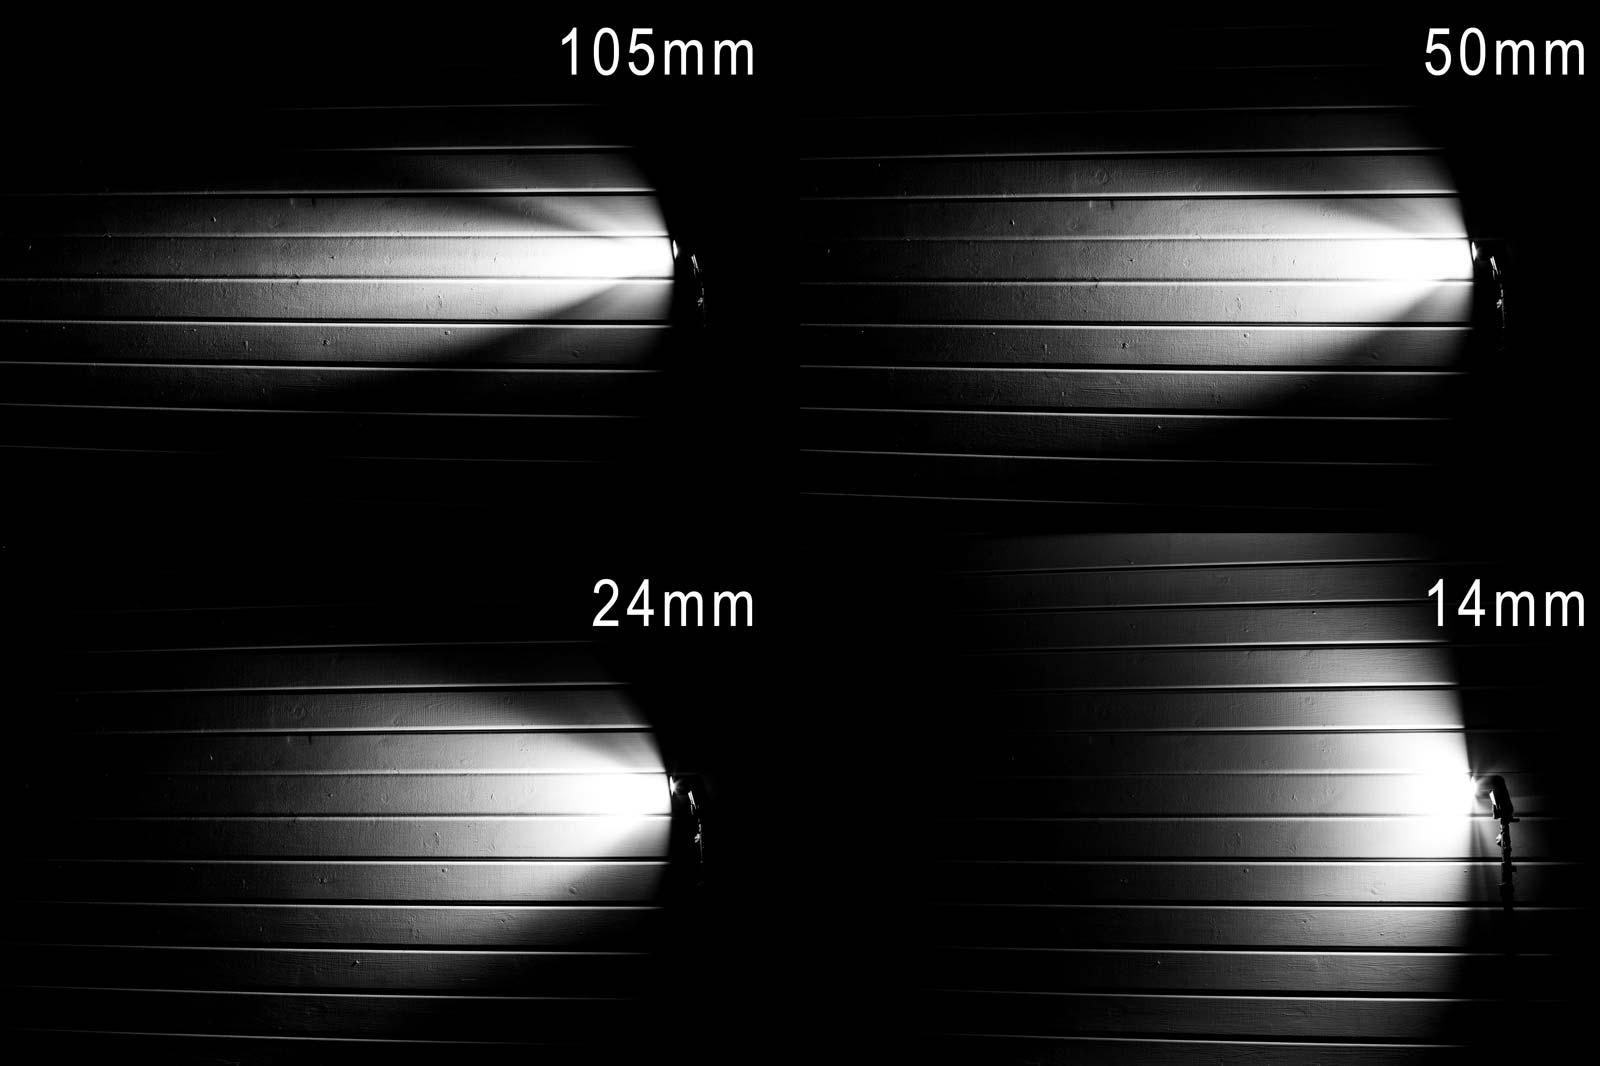 speedlights brollies and zooming flashes gavtrain com